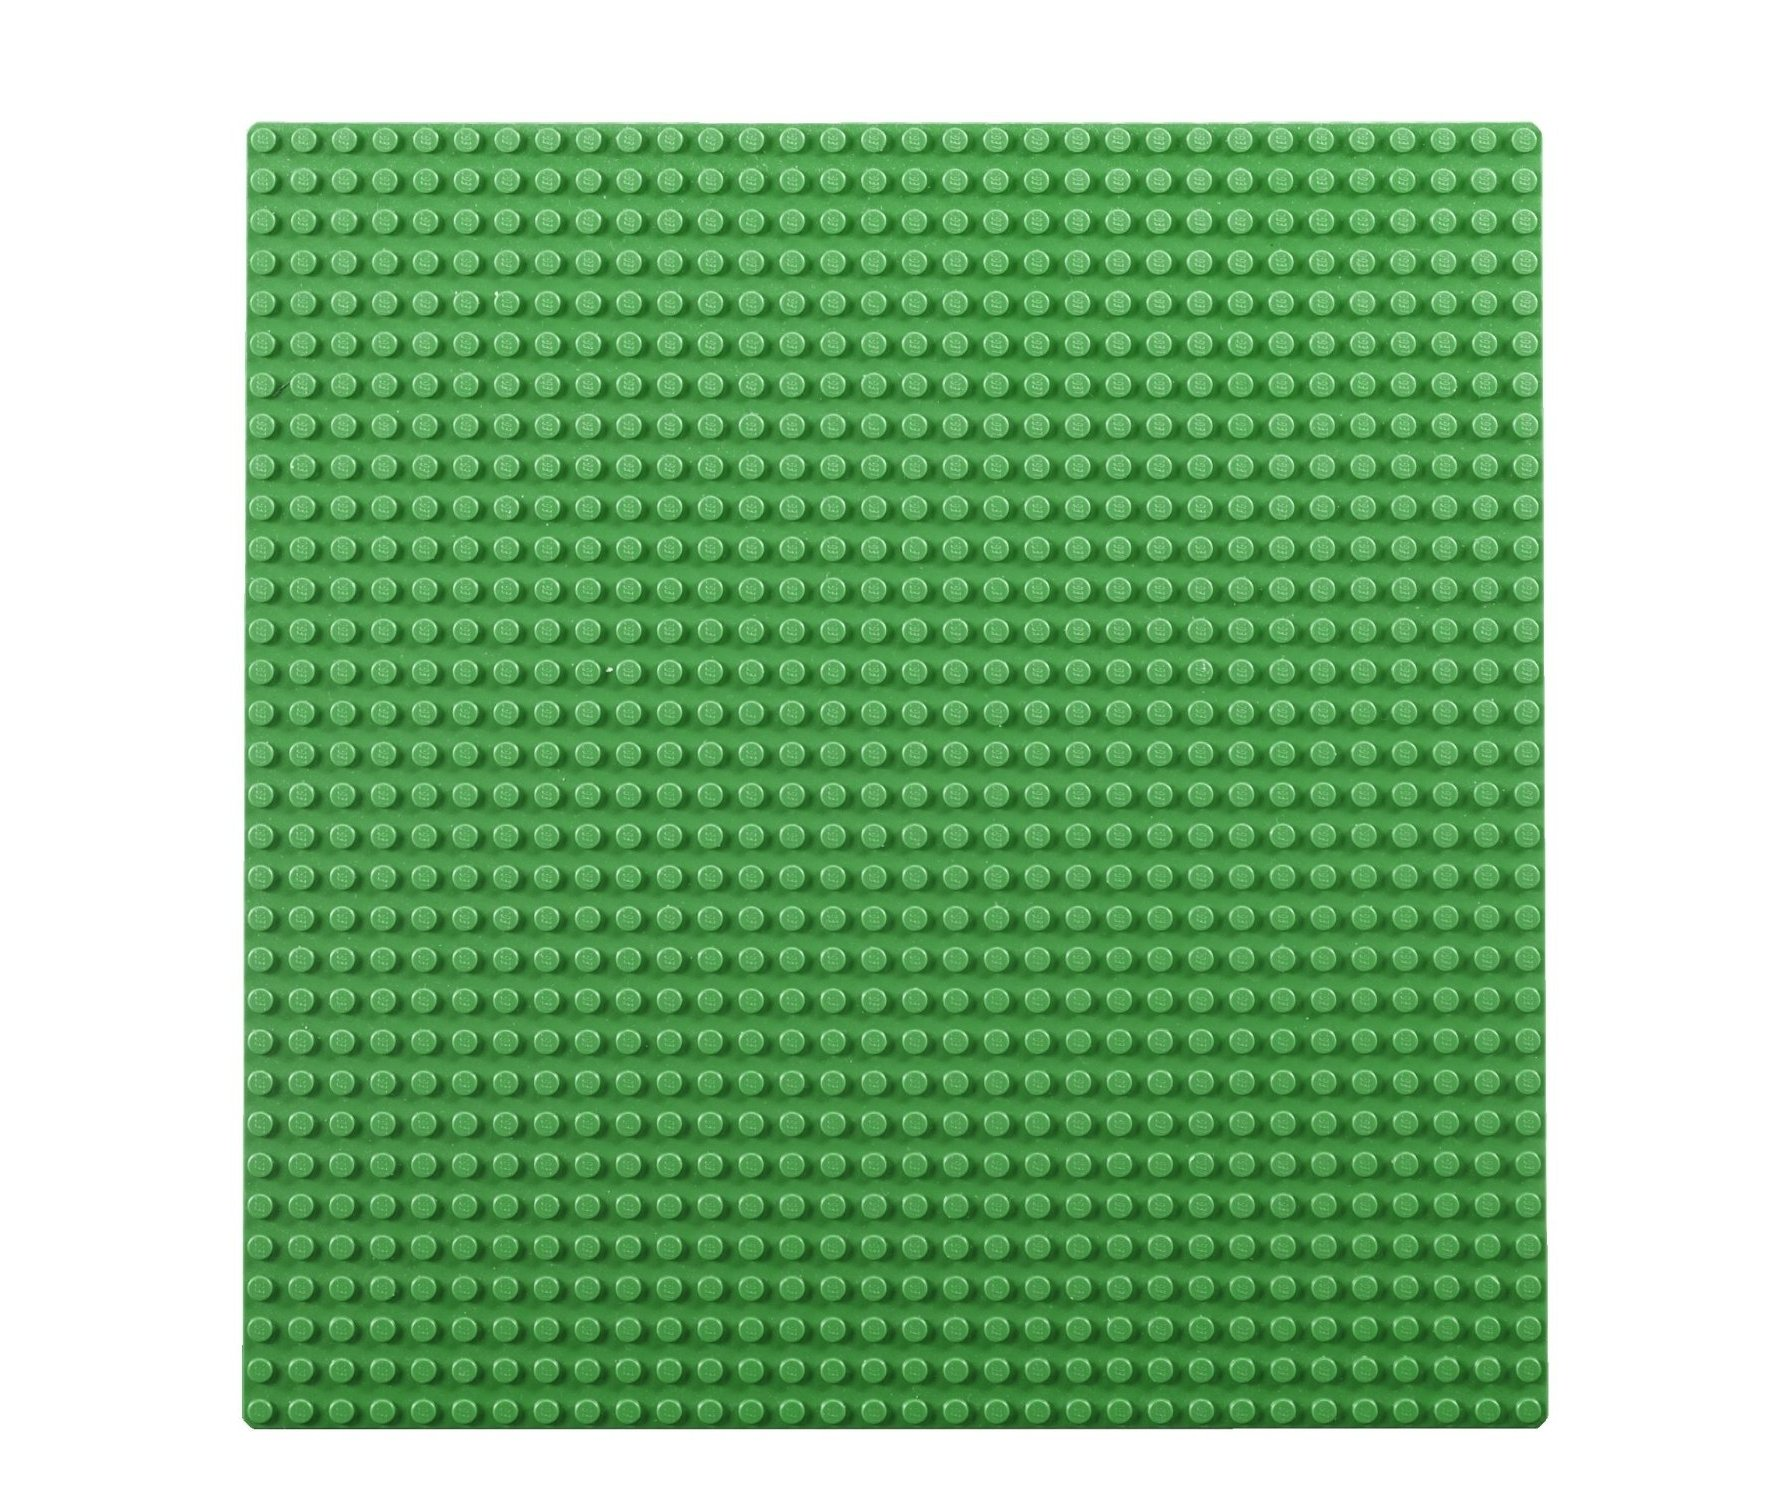 10 x 10 Set of 4 LEGO Green Baseplate 626